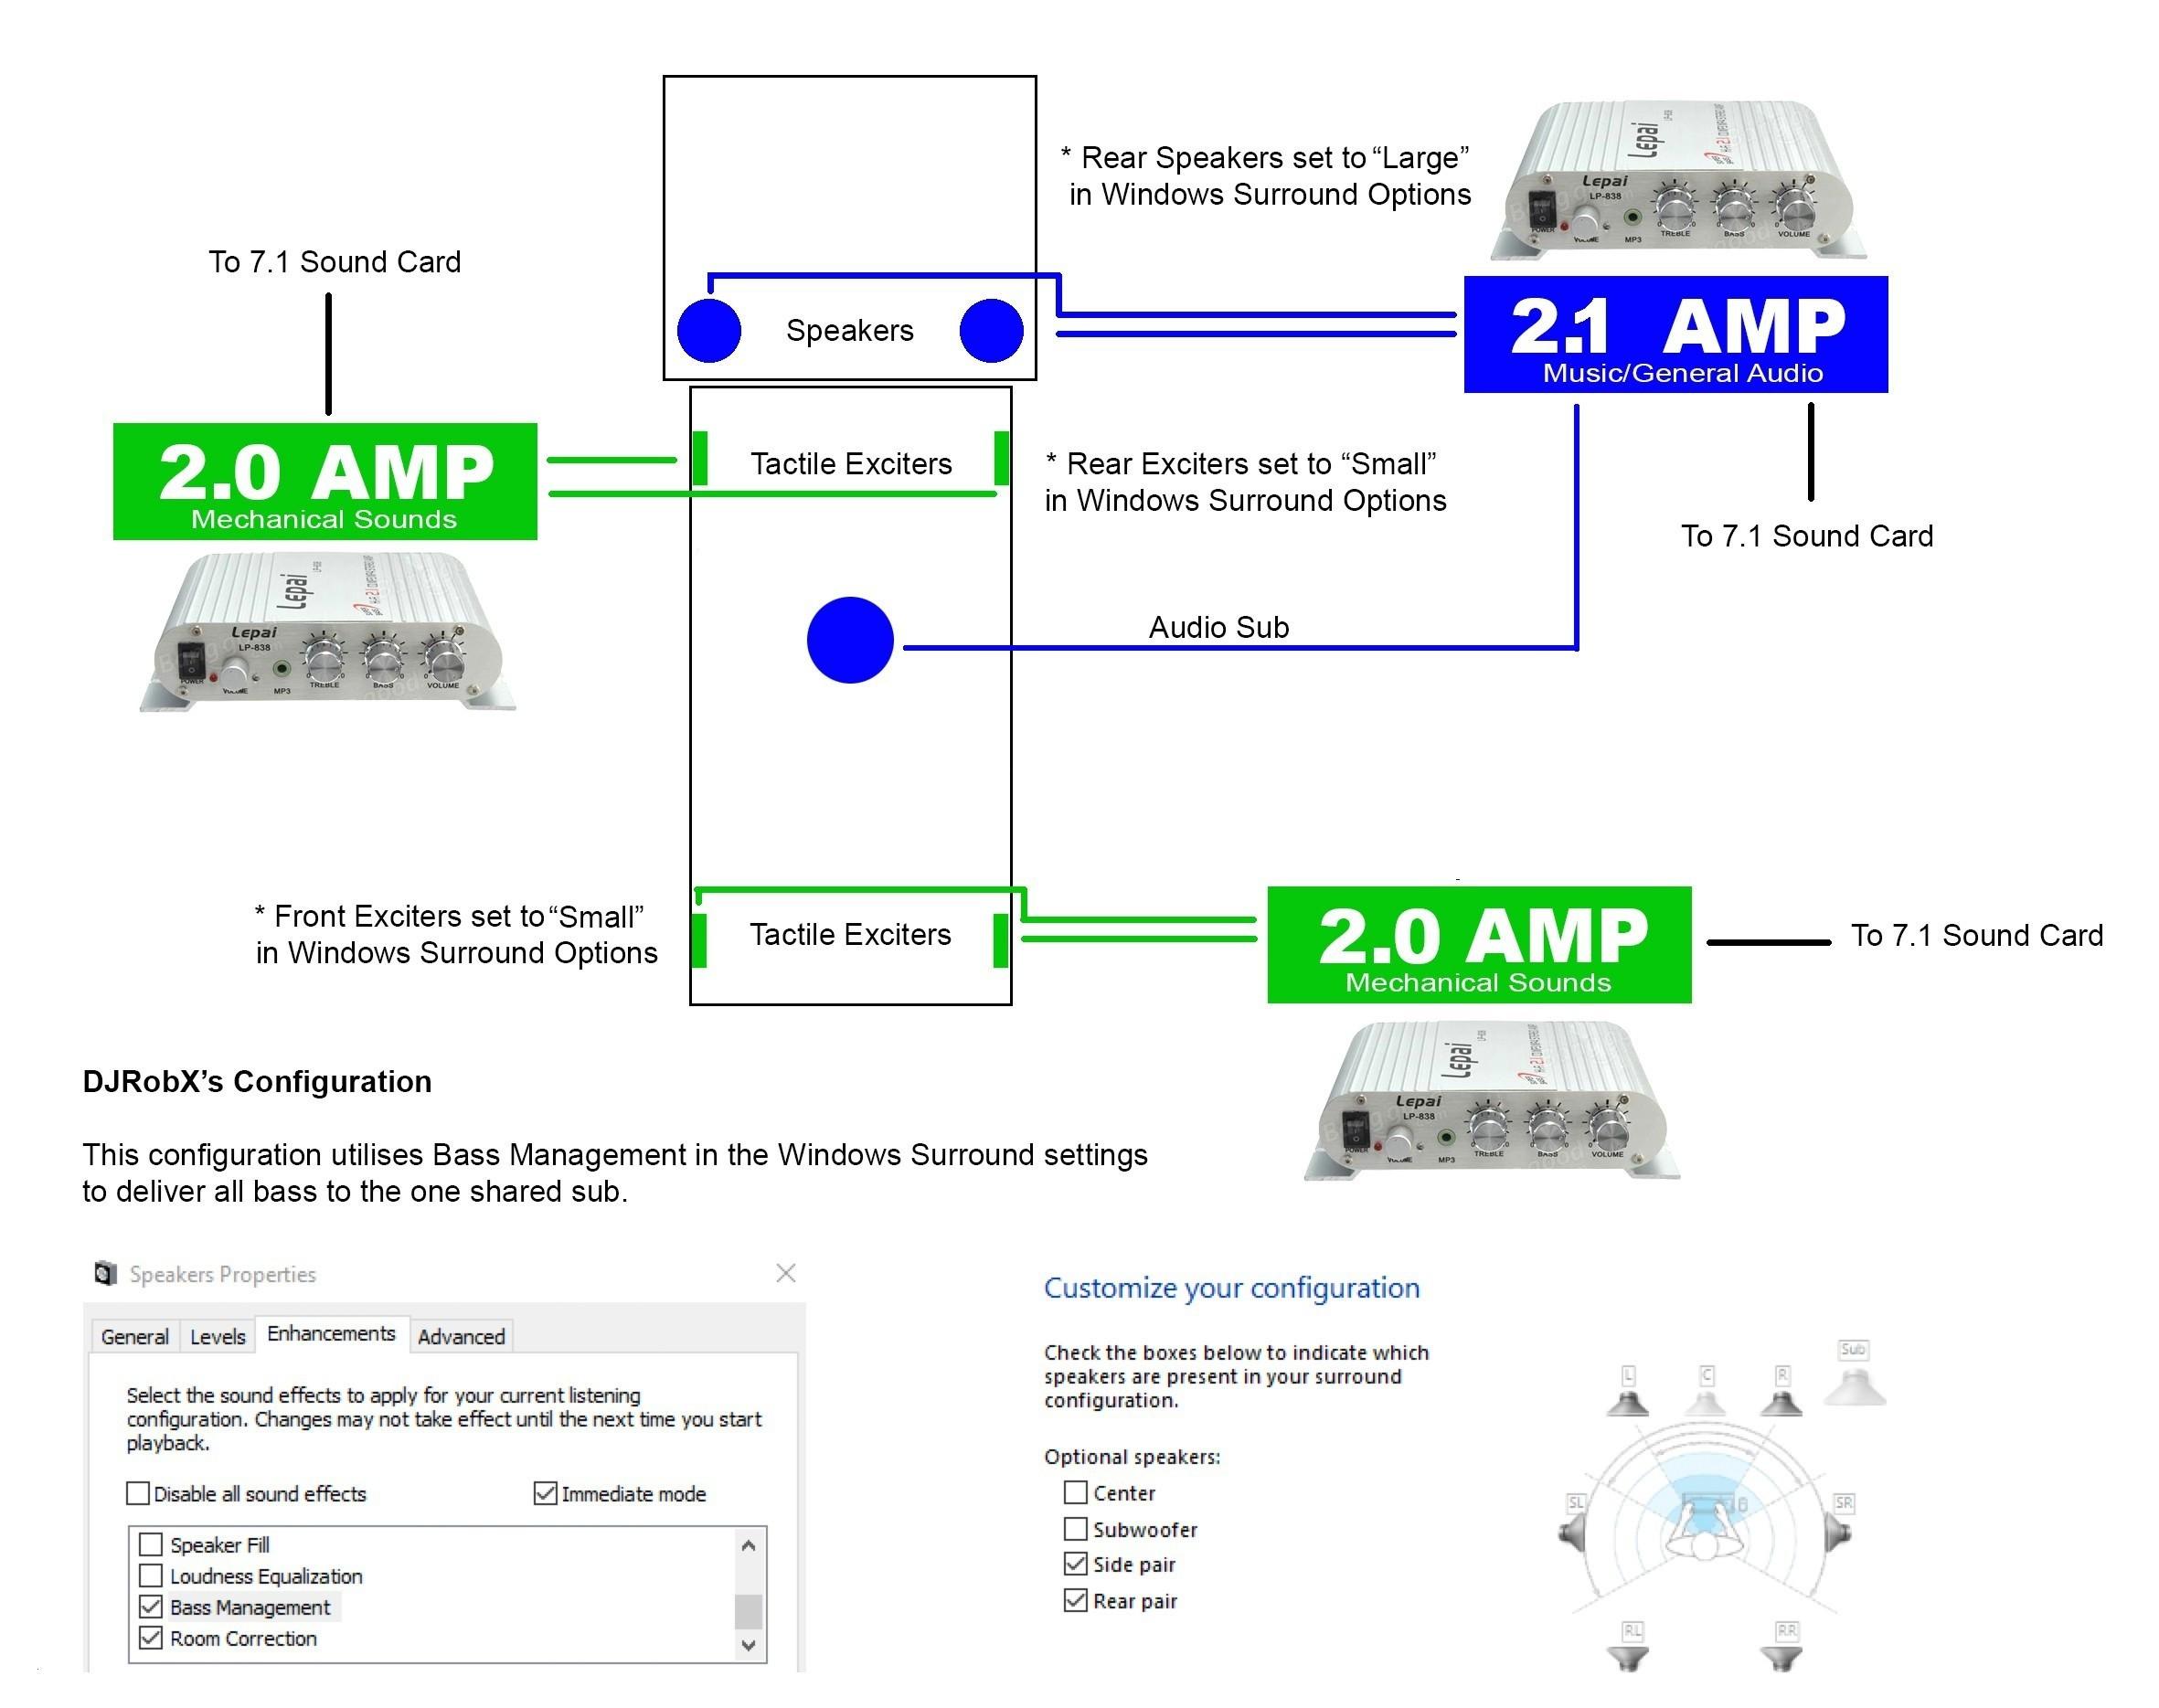 Car Audio Diagrams and Charts Person Diagram Schaferforcongressfo Schaferforcongressfo Of Car Audio Diagrams and Charts